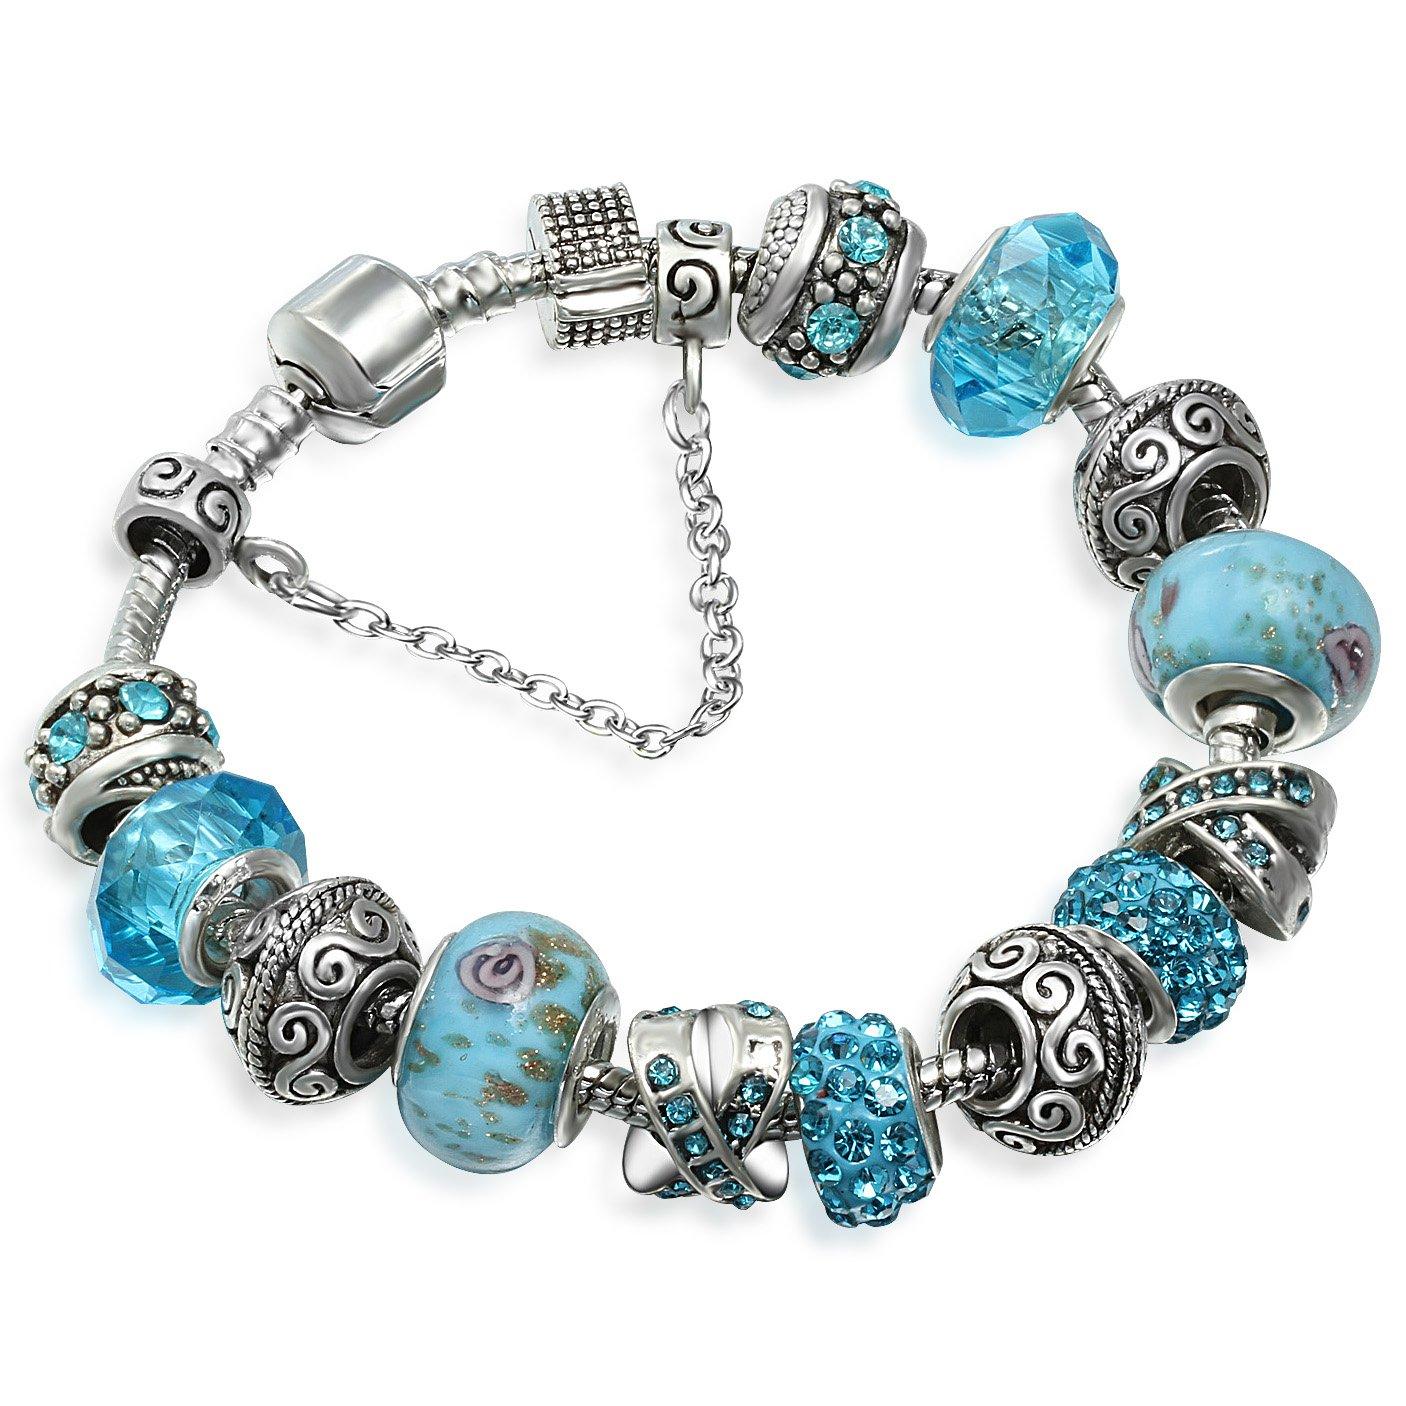 A TE® Bracelet Charms Bleu Femmes Rêve Fascinant Cadeau #JW-B94 ATE